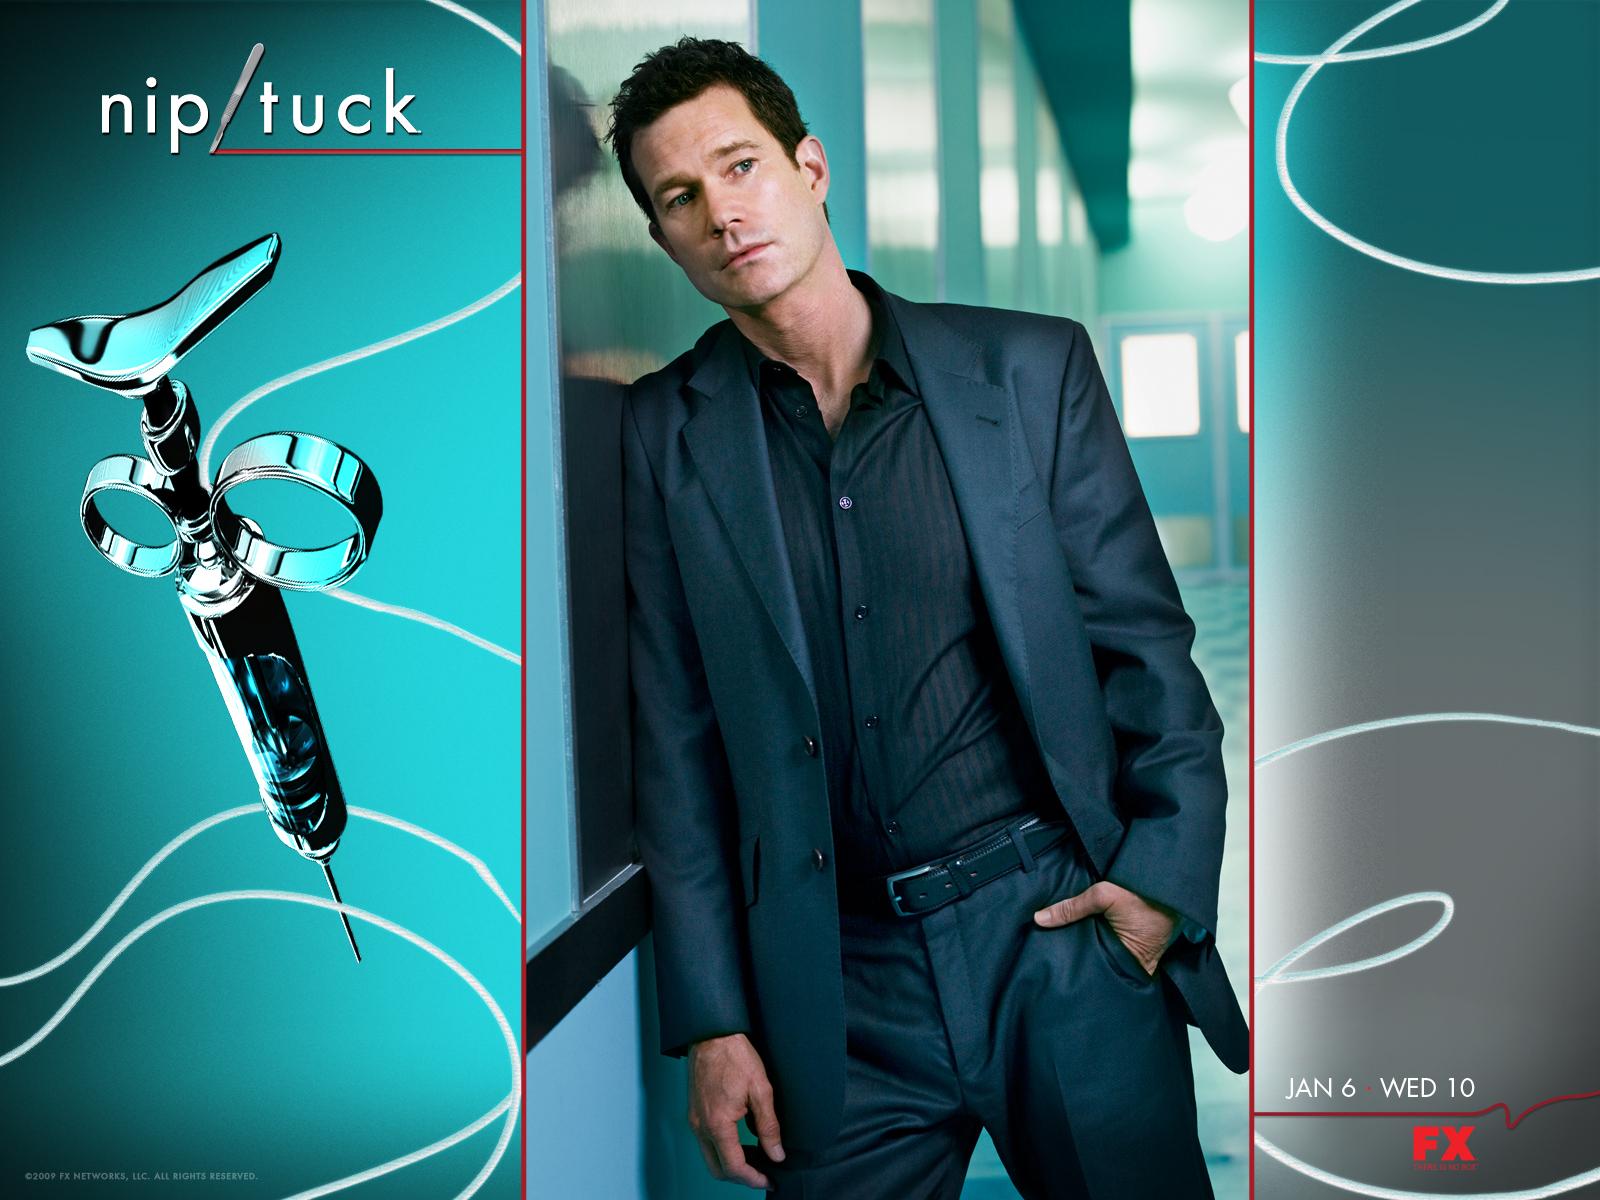 Nip Tuck Promo Posters